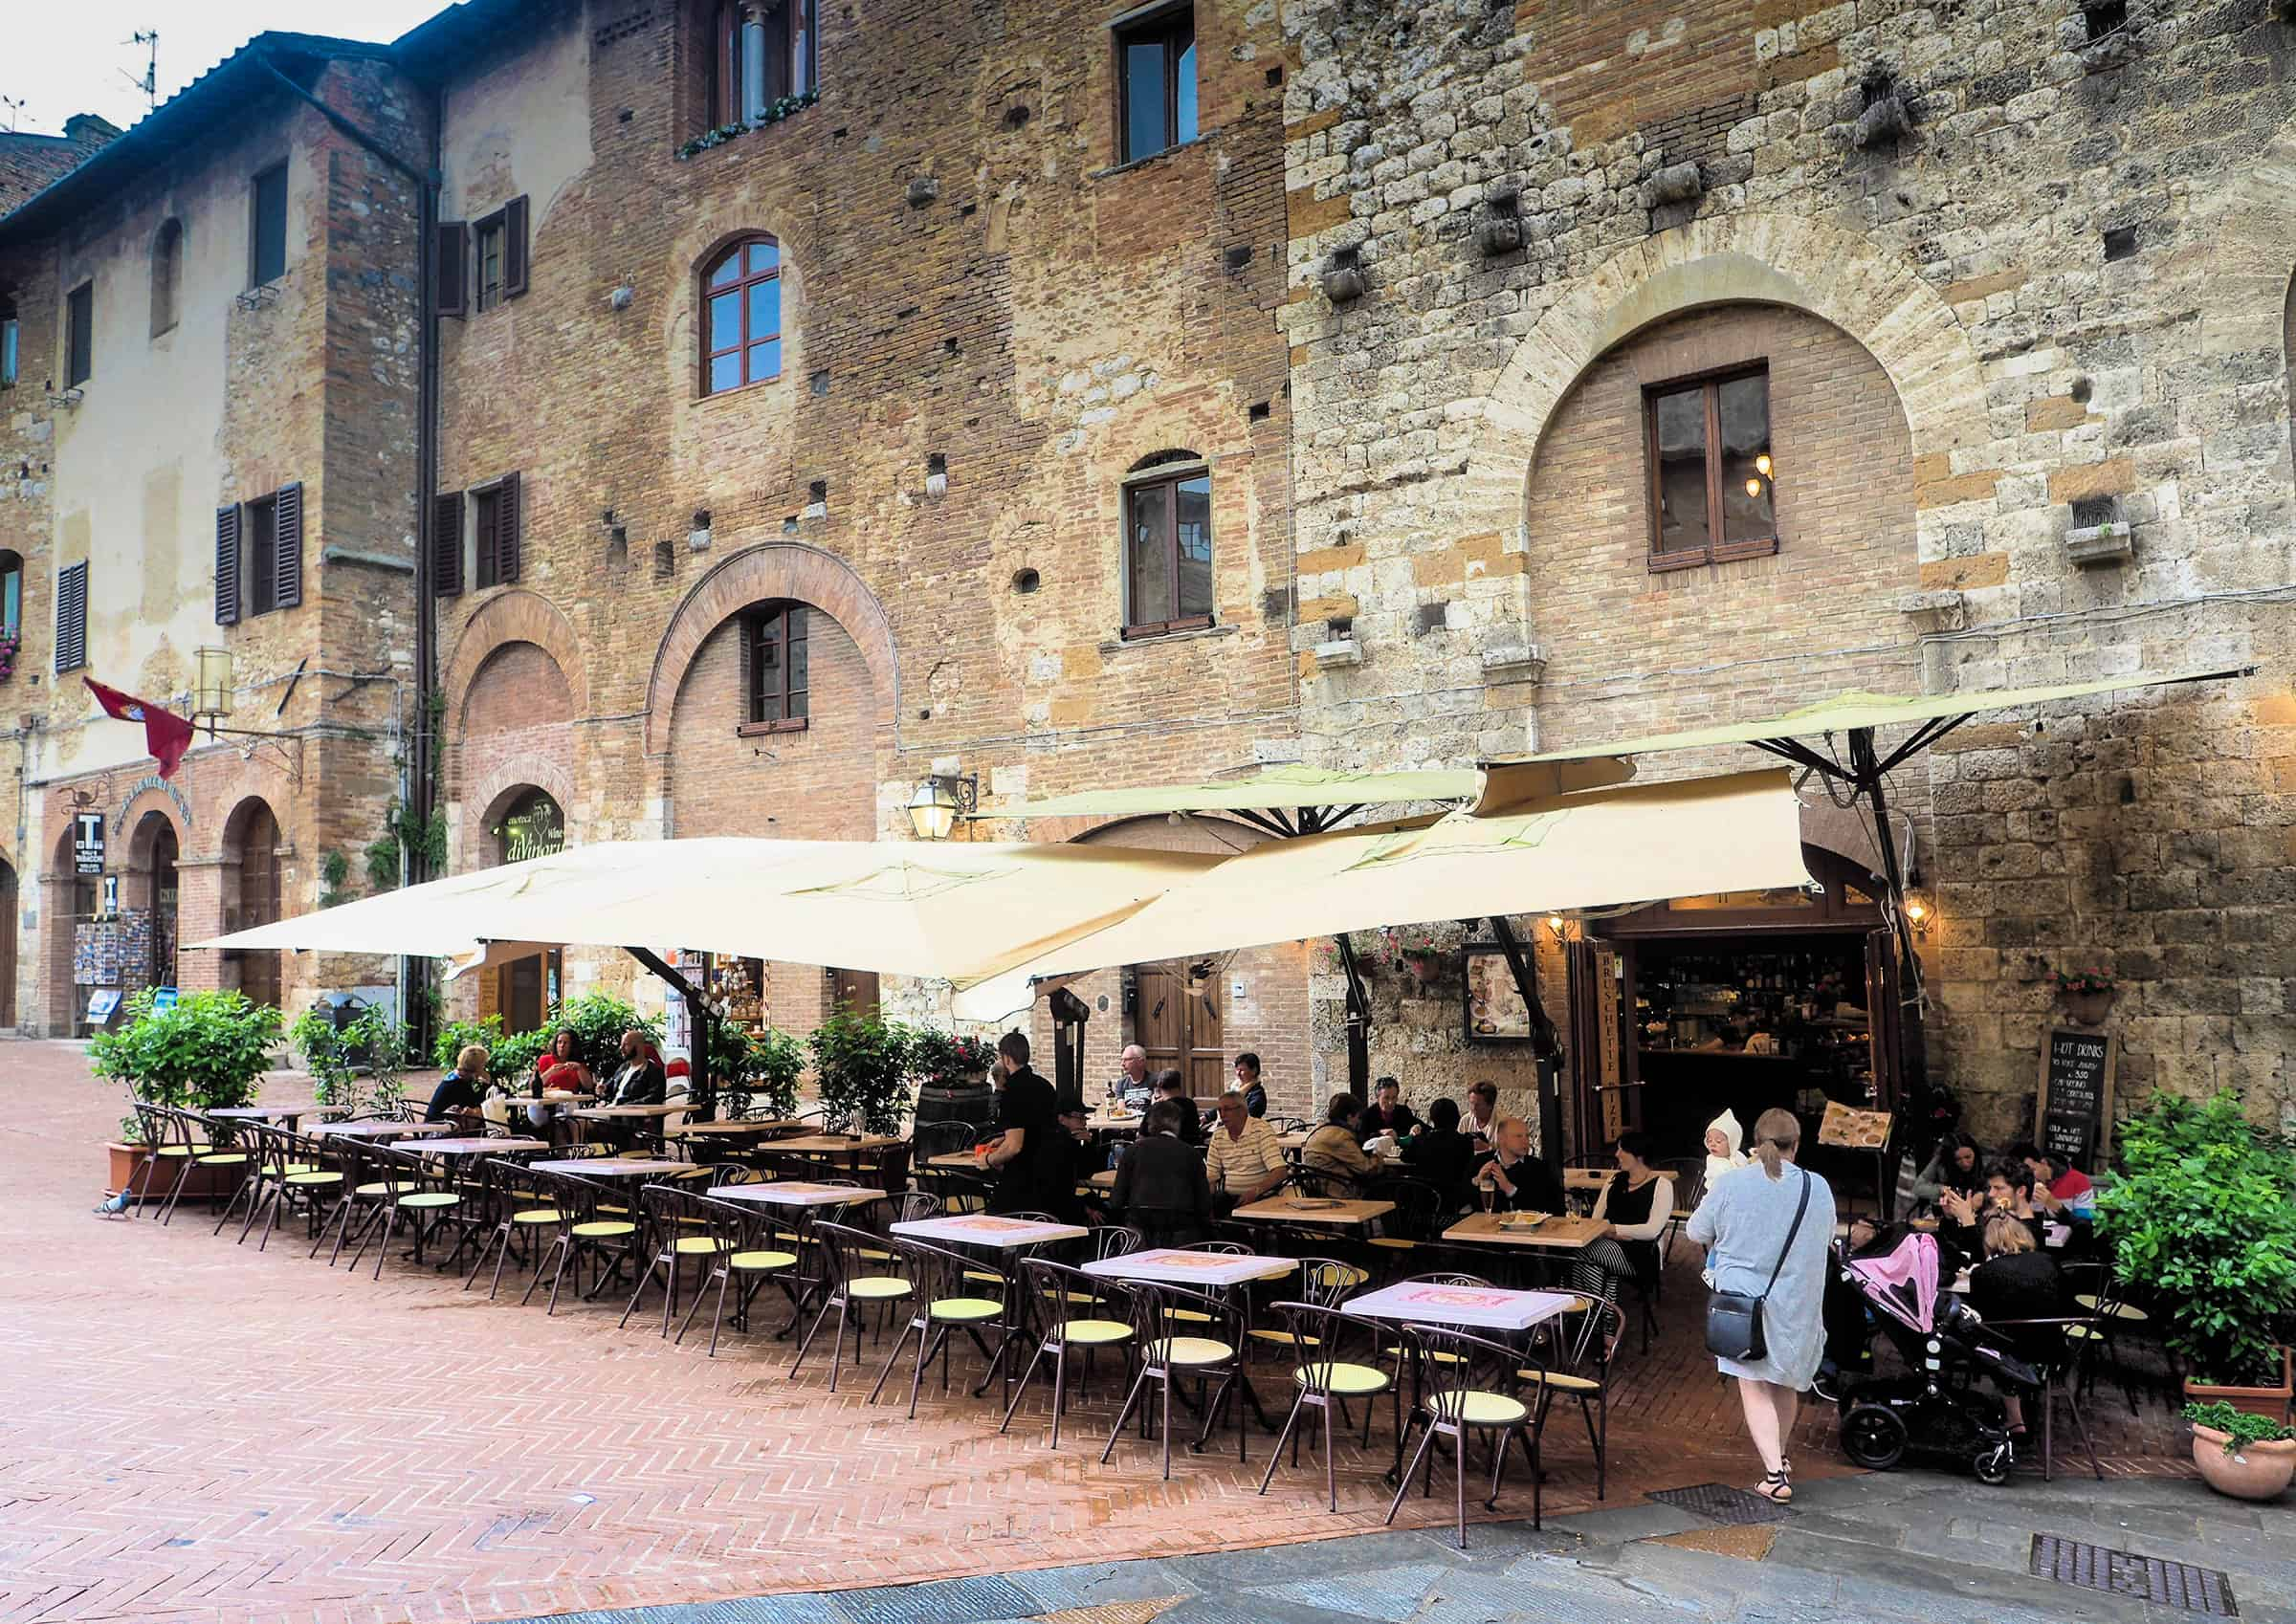 Het centrum van San Gimignano